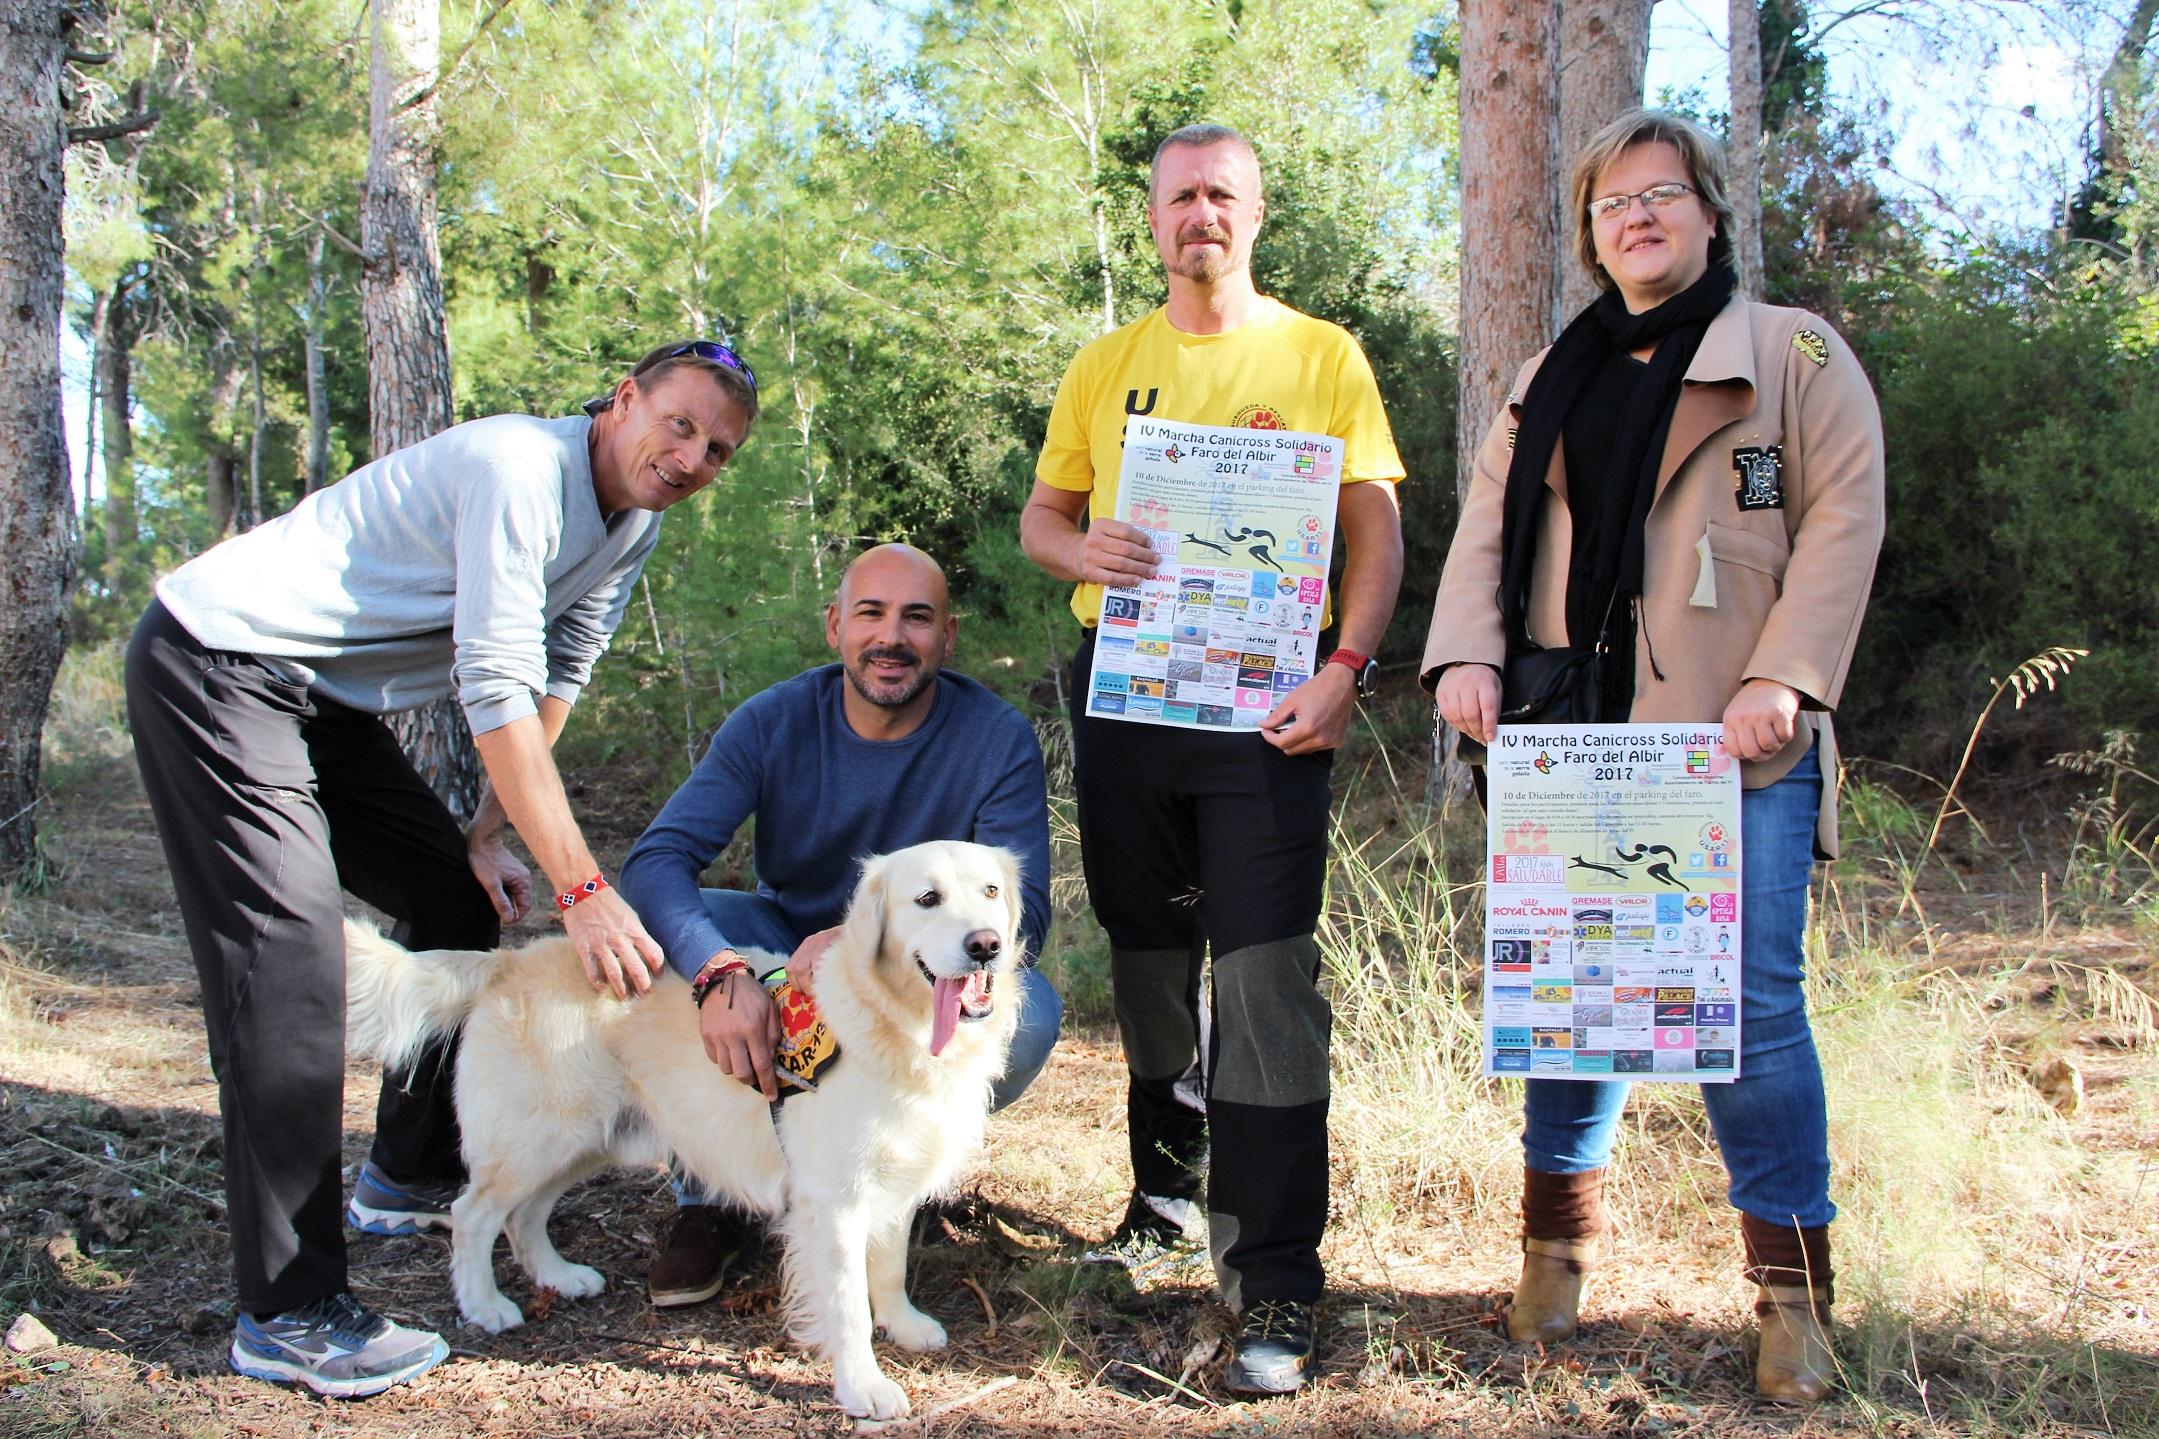 El canicross solidario de l'Alfàs del Pi llega a su  cuarta edición